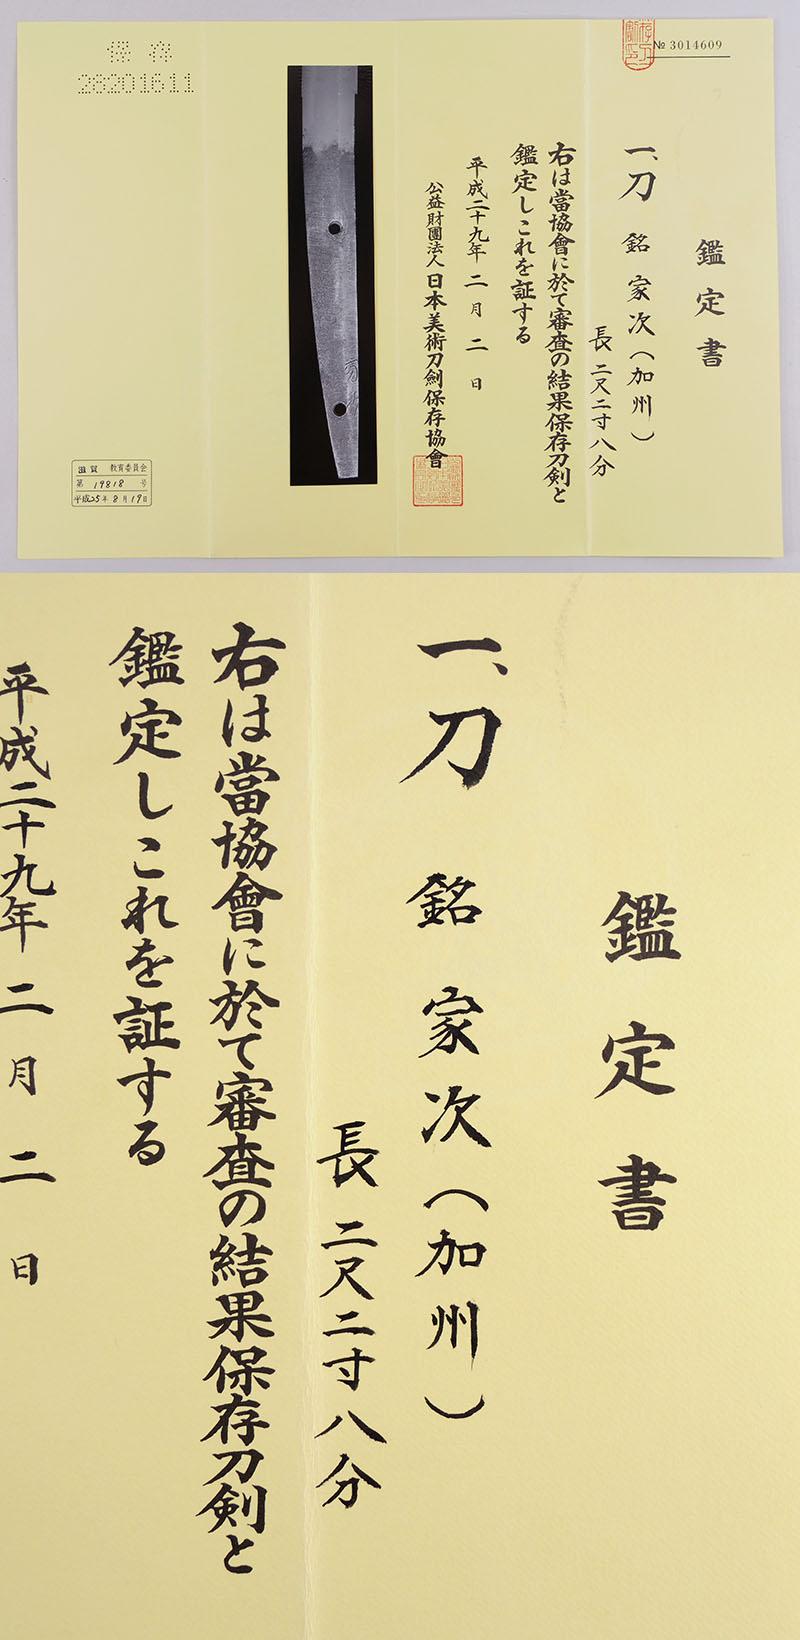 家次(加州)(加賀青江) Picture of Certificate